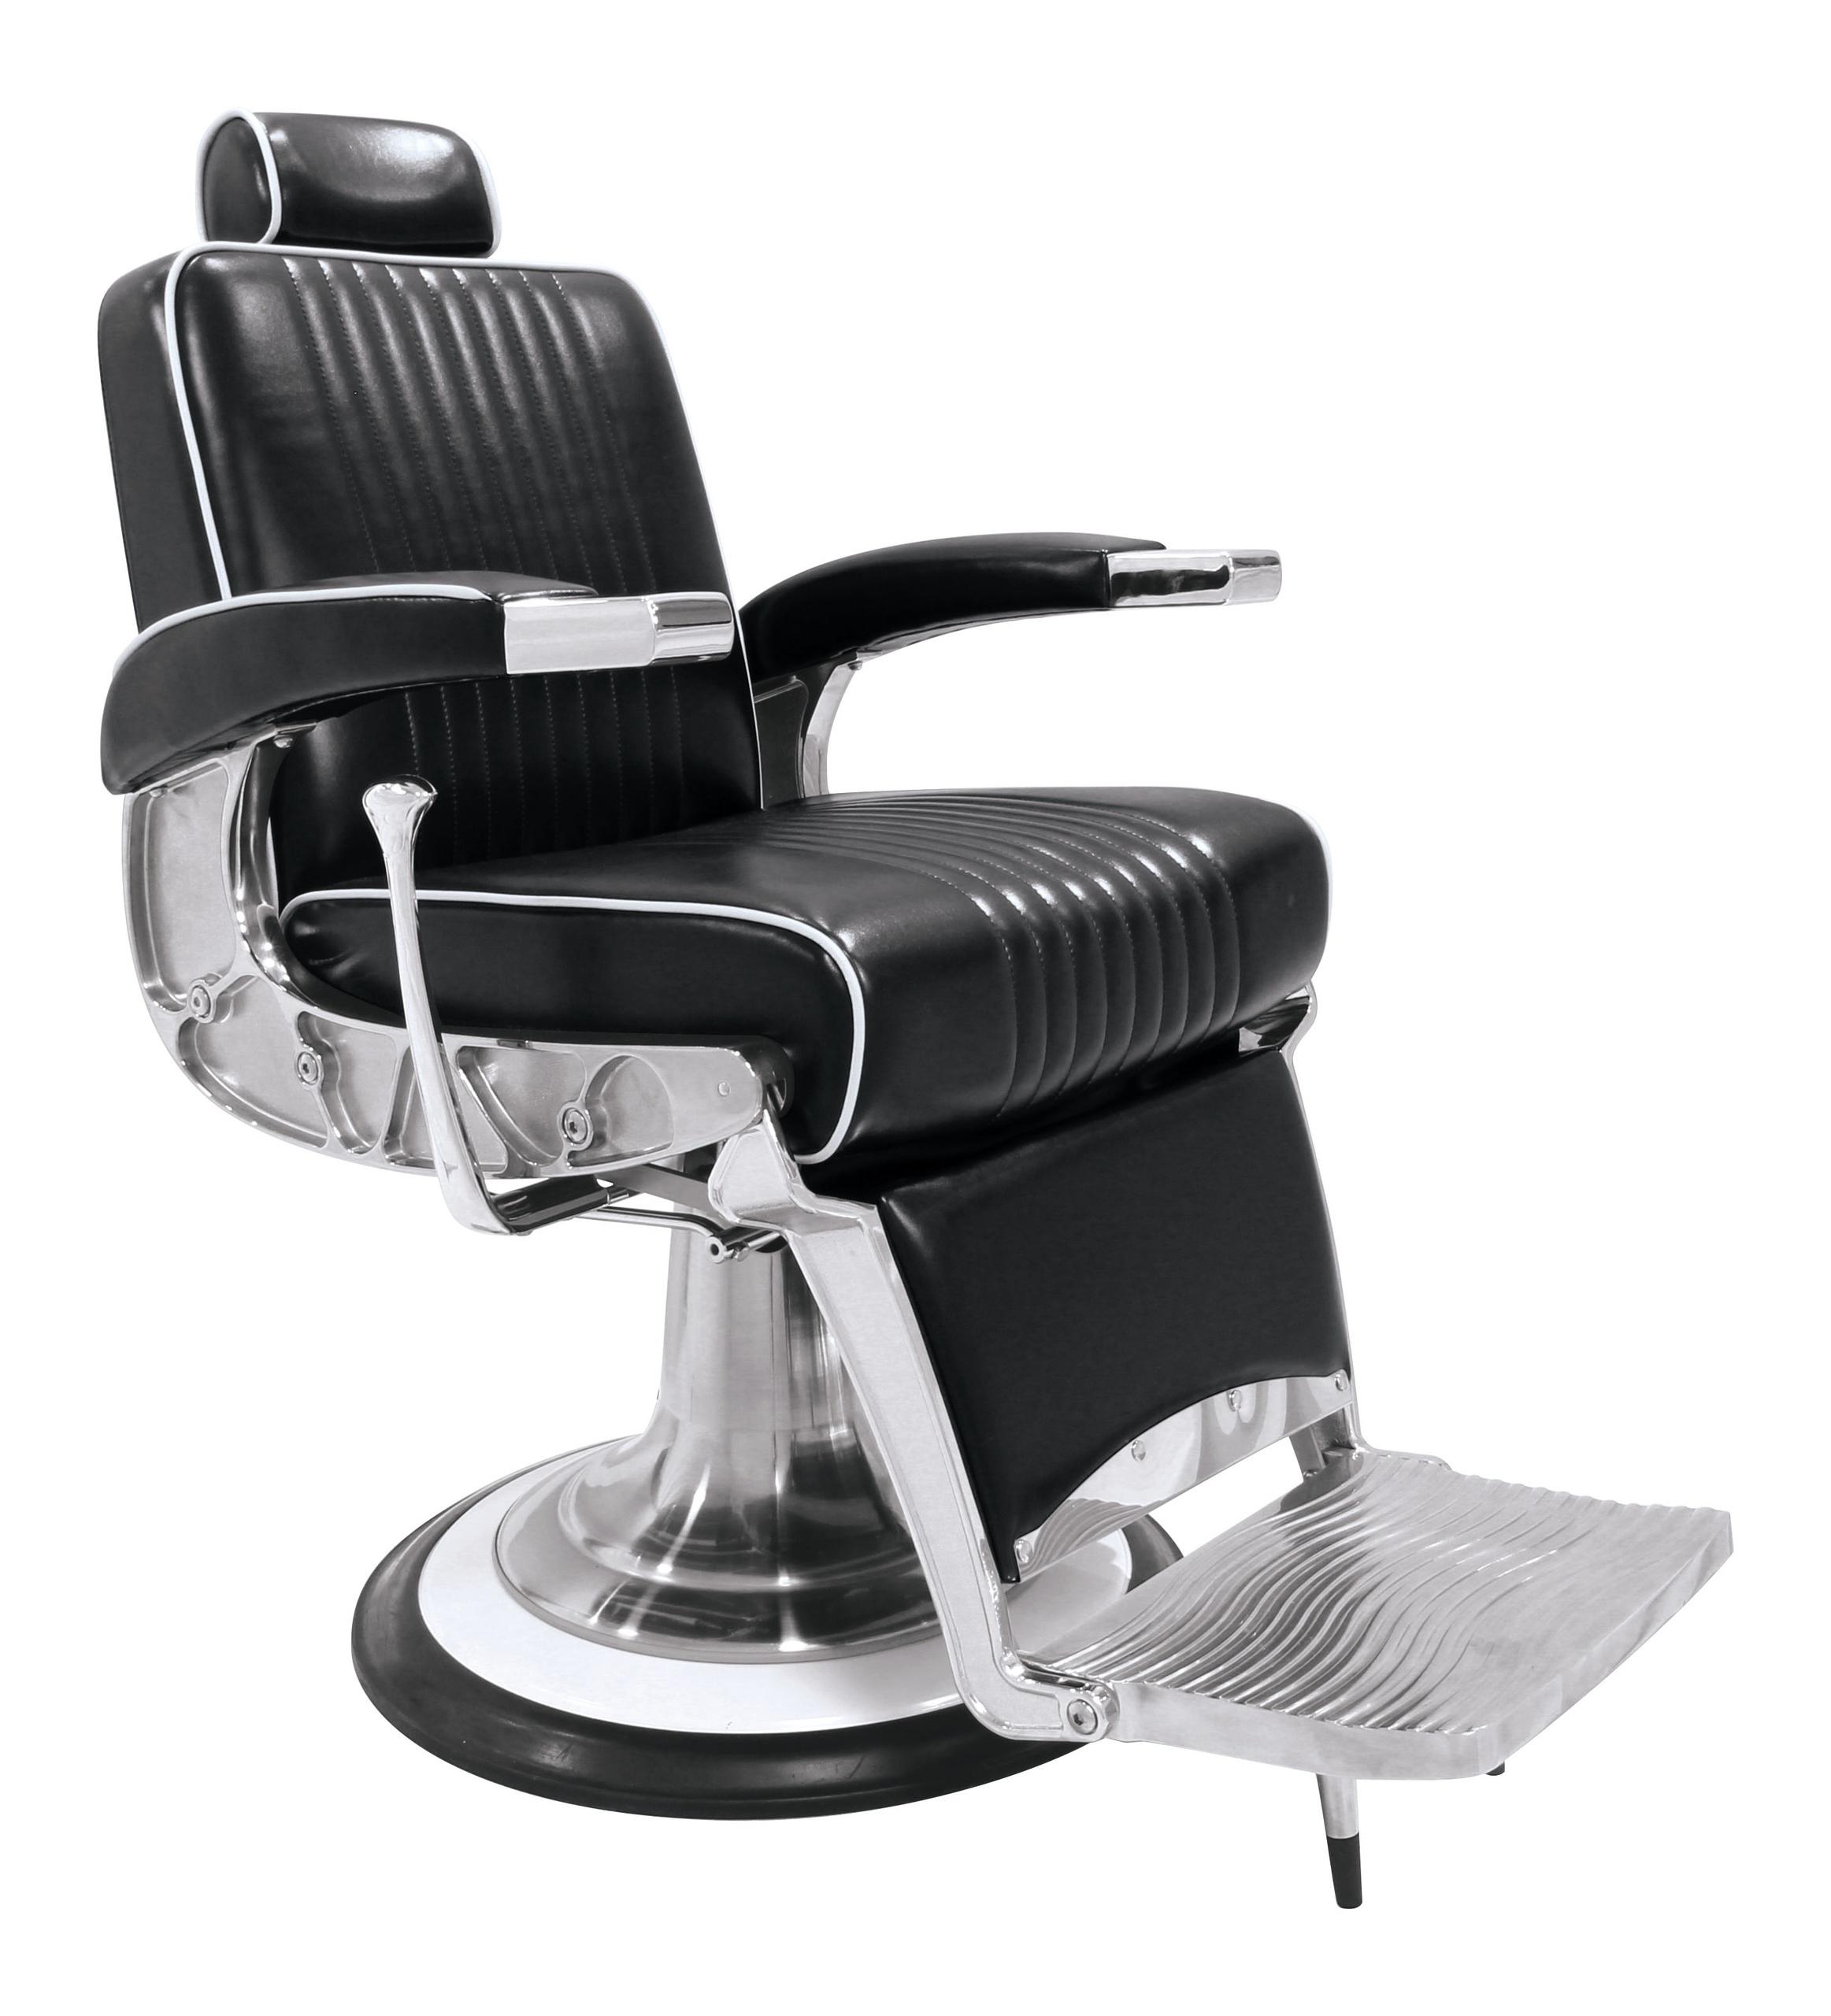 fauteuil barbier vintage mustang jacques seban. Black Bedroom Furniture Sets. Home Design Ideas